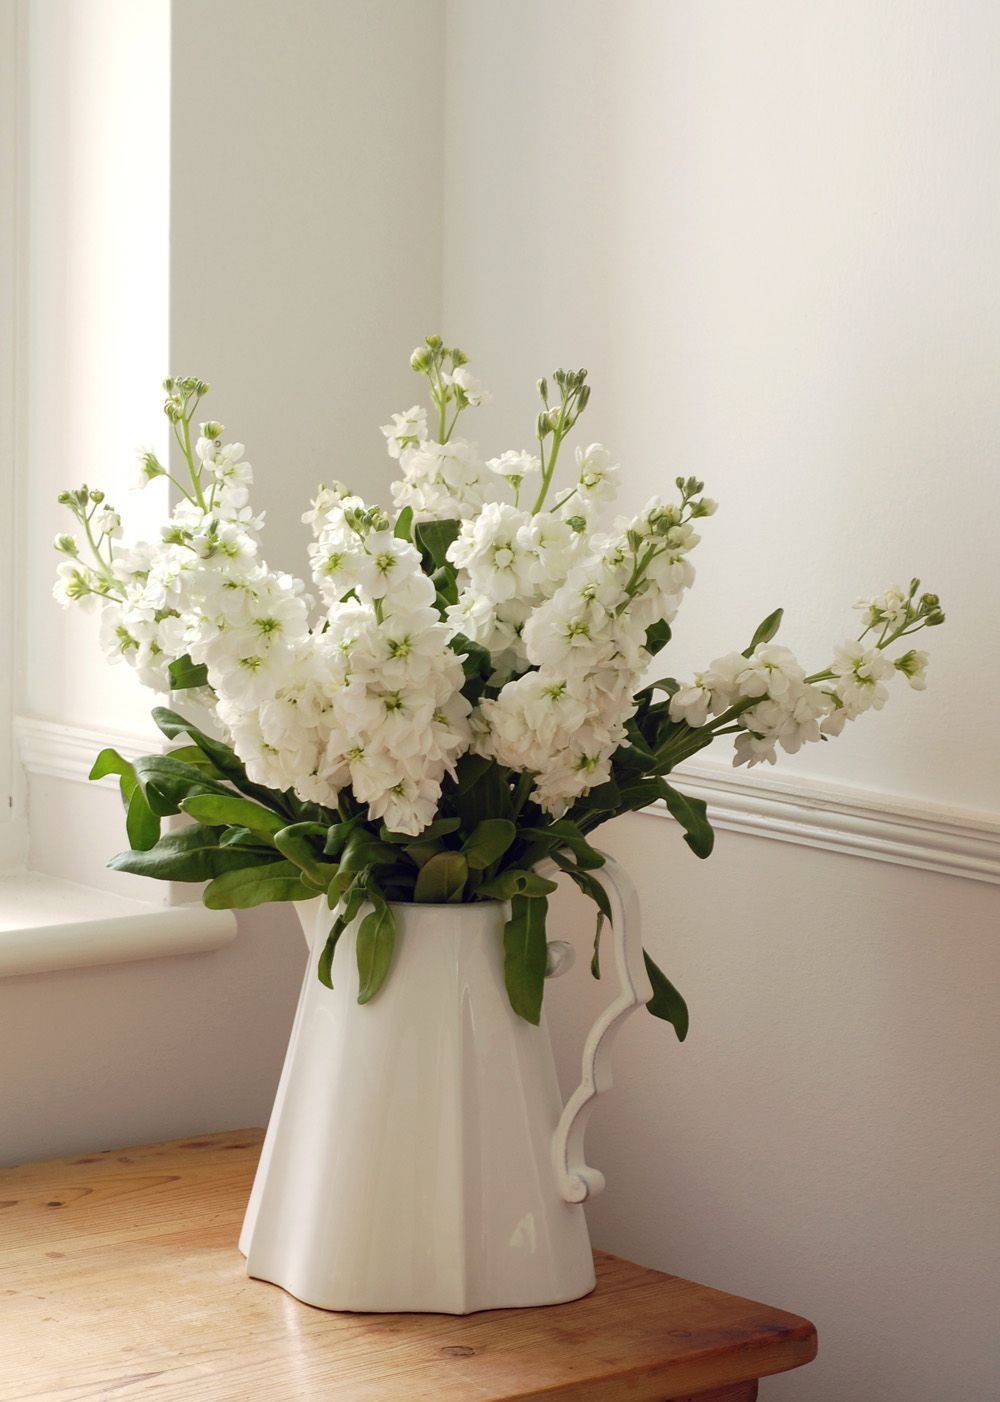 Metal Flower Pitcher Vase for Indoor Outdoor Flowers and Artificial Flowers